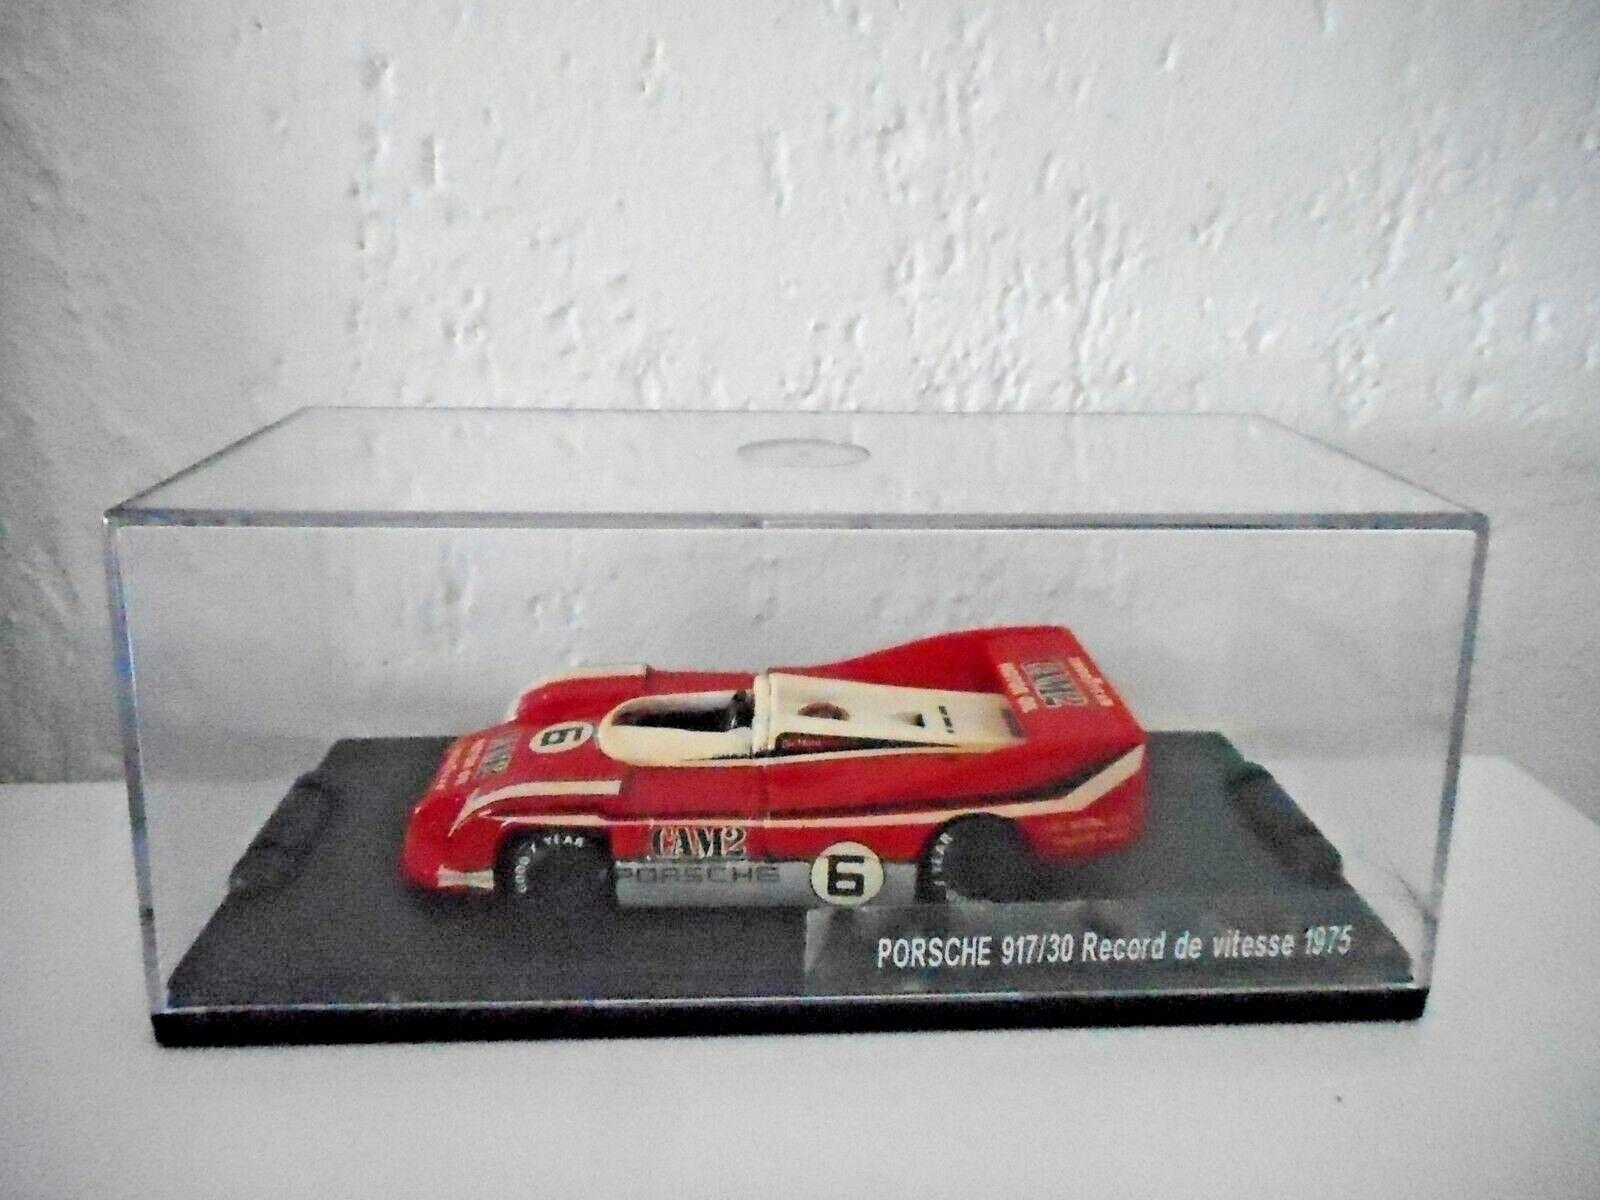 Rare  PORCHE 917 30 CAN AM RECORD DE VITESSE1975 IVES  EVRAT ELIGOR minichamps